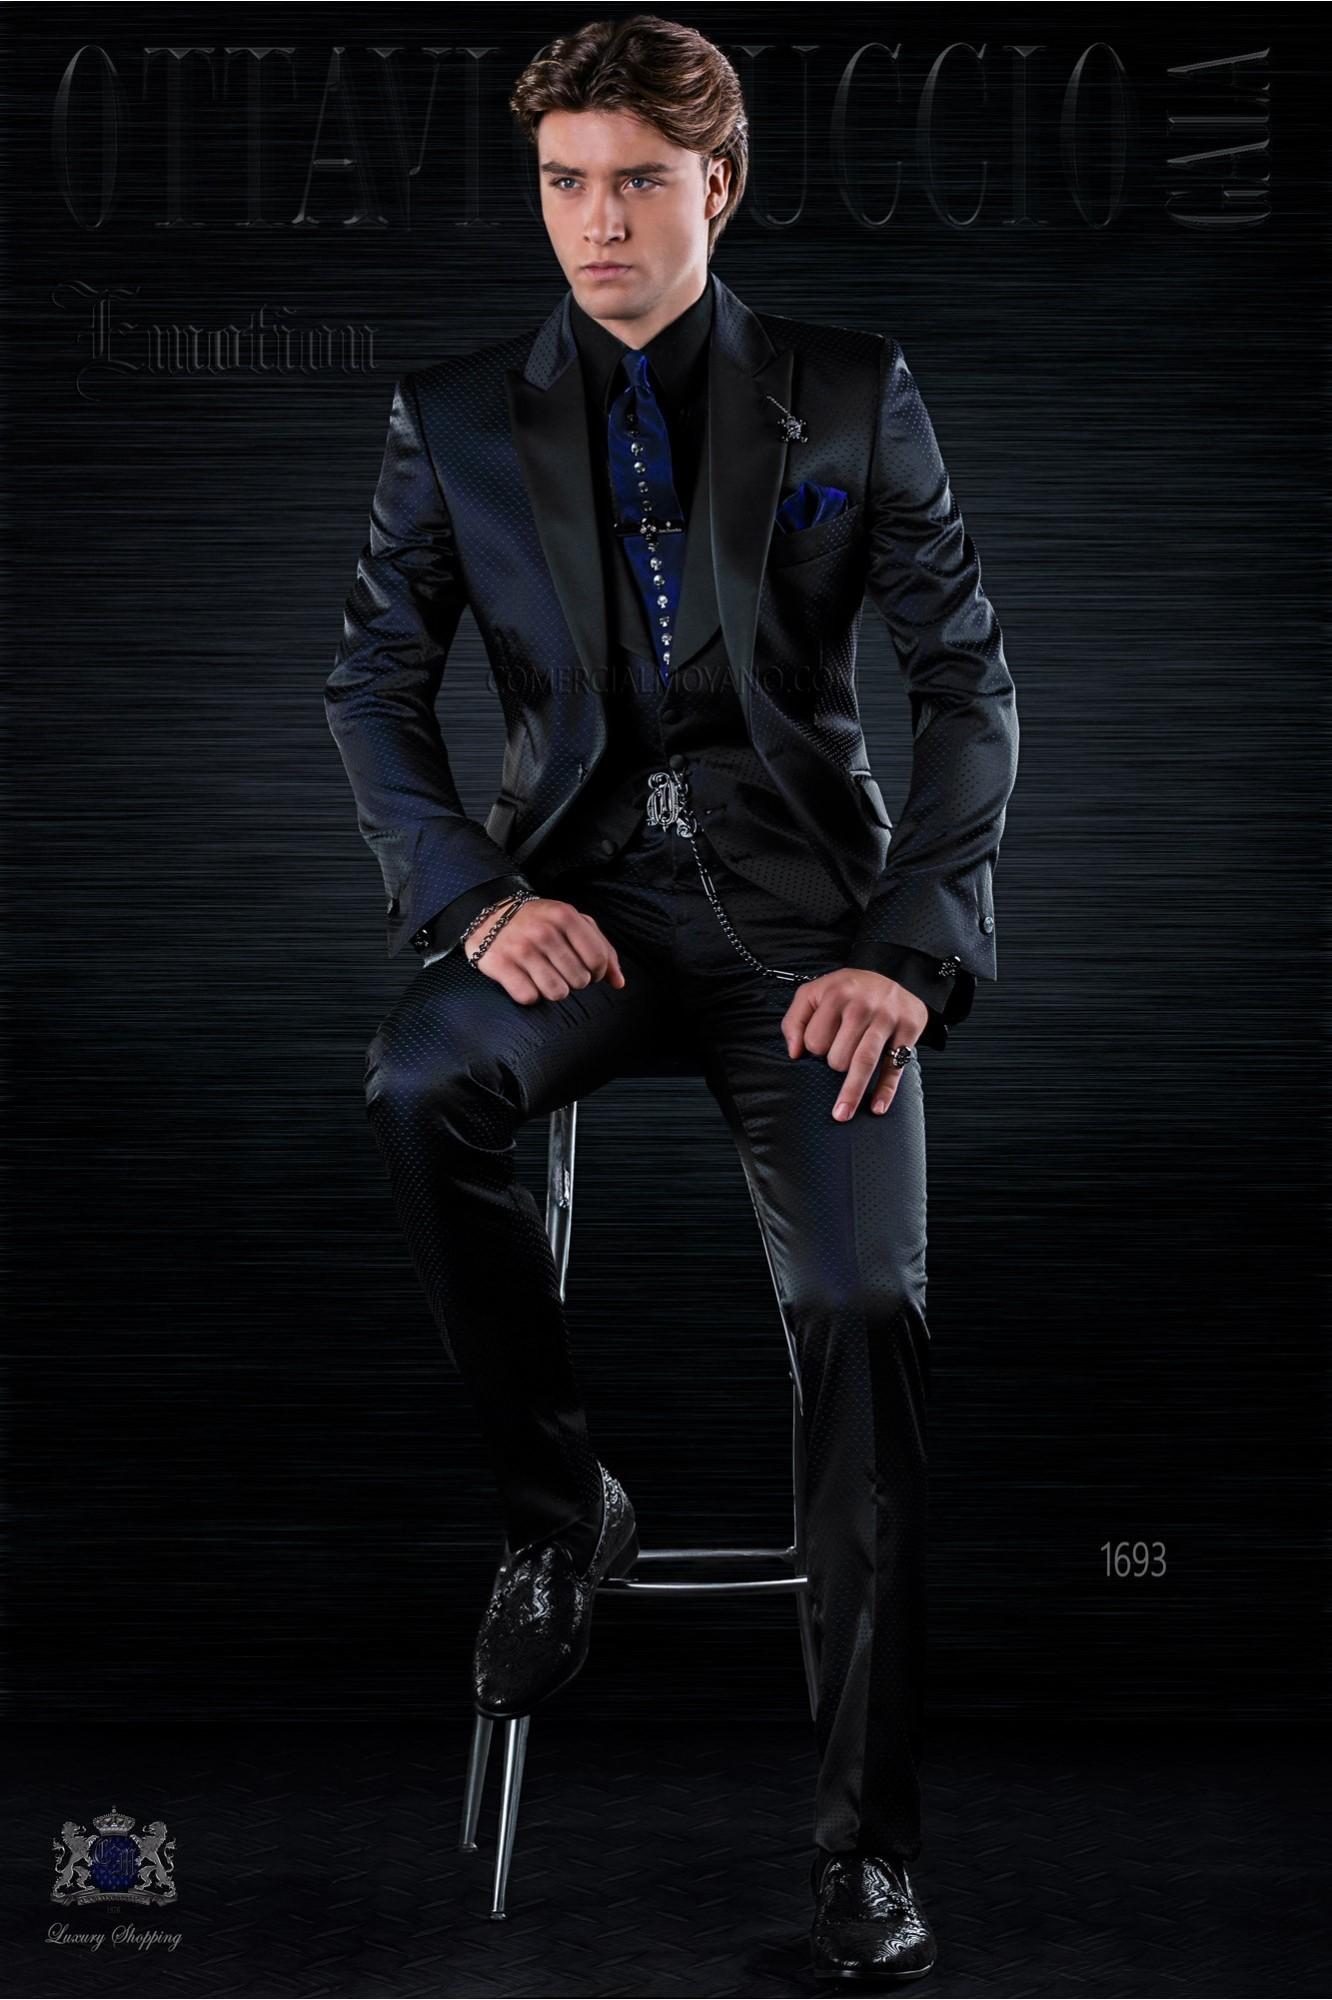 Fashion italian bespoke polka dots black and blue suit